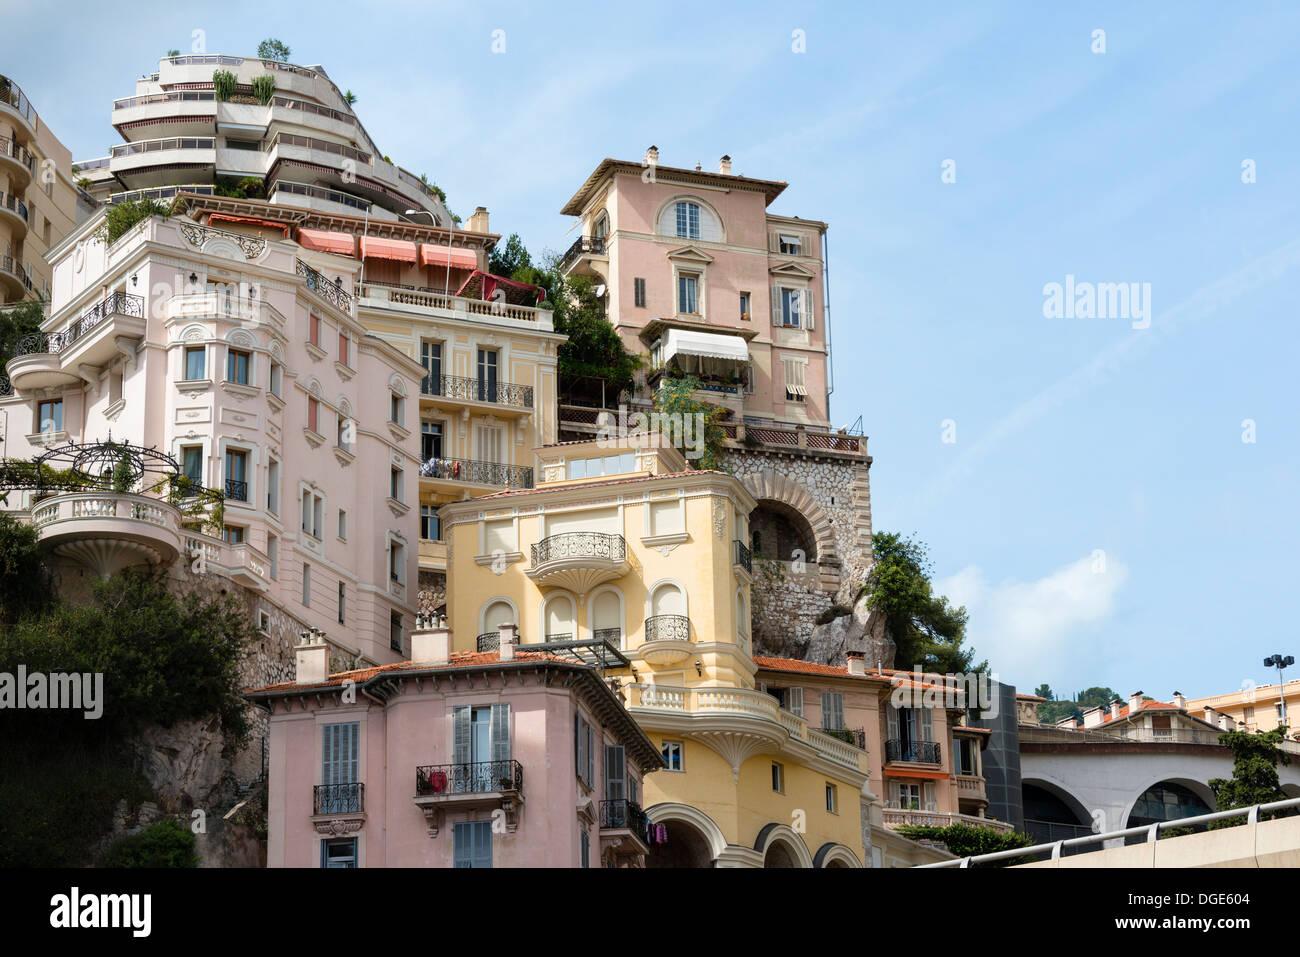 High density housing in Monaco - Stock Image